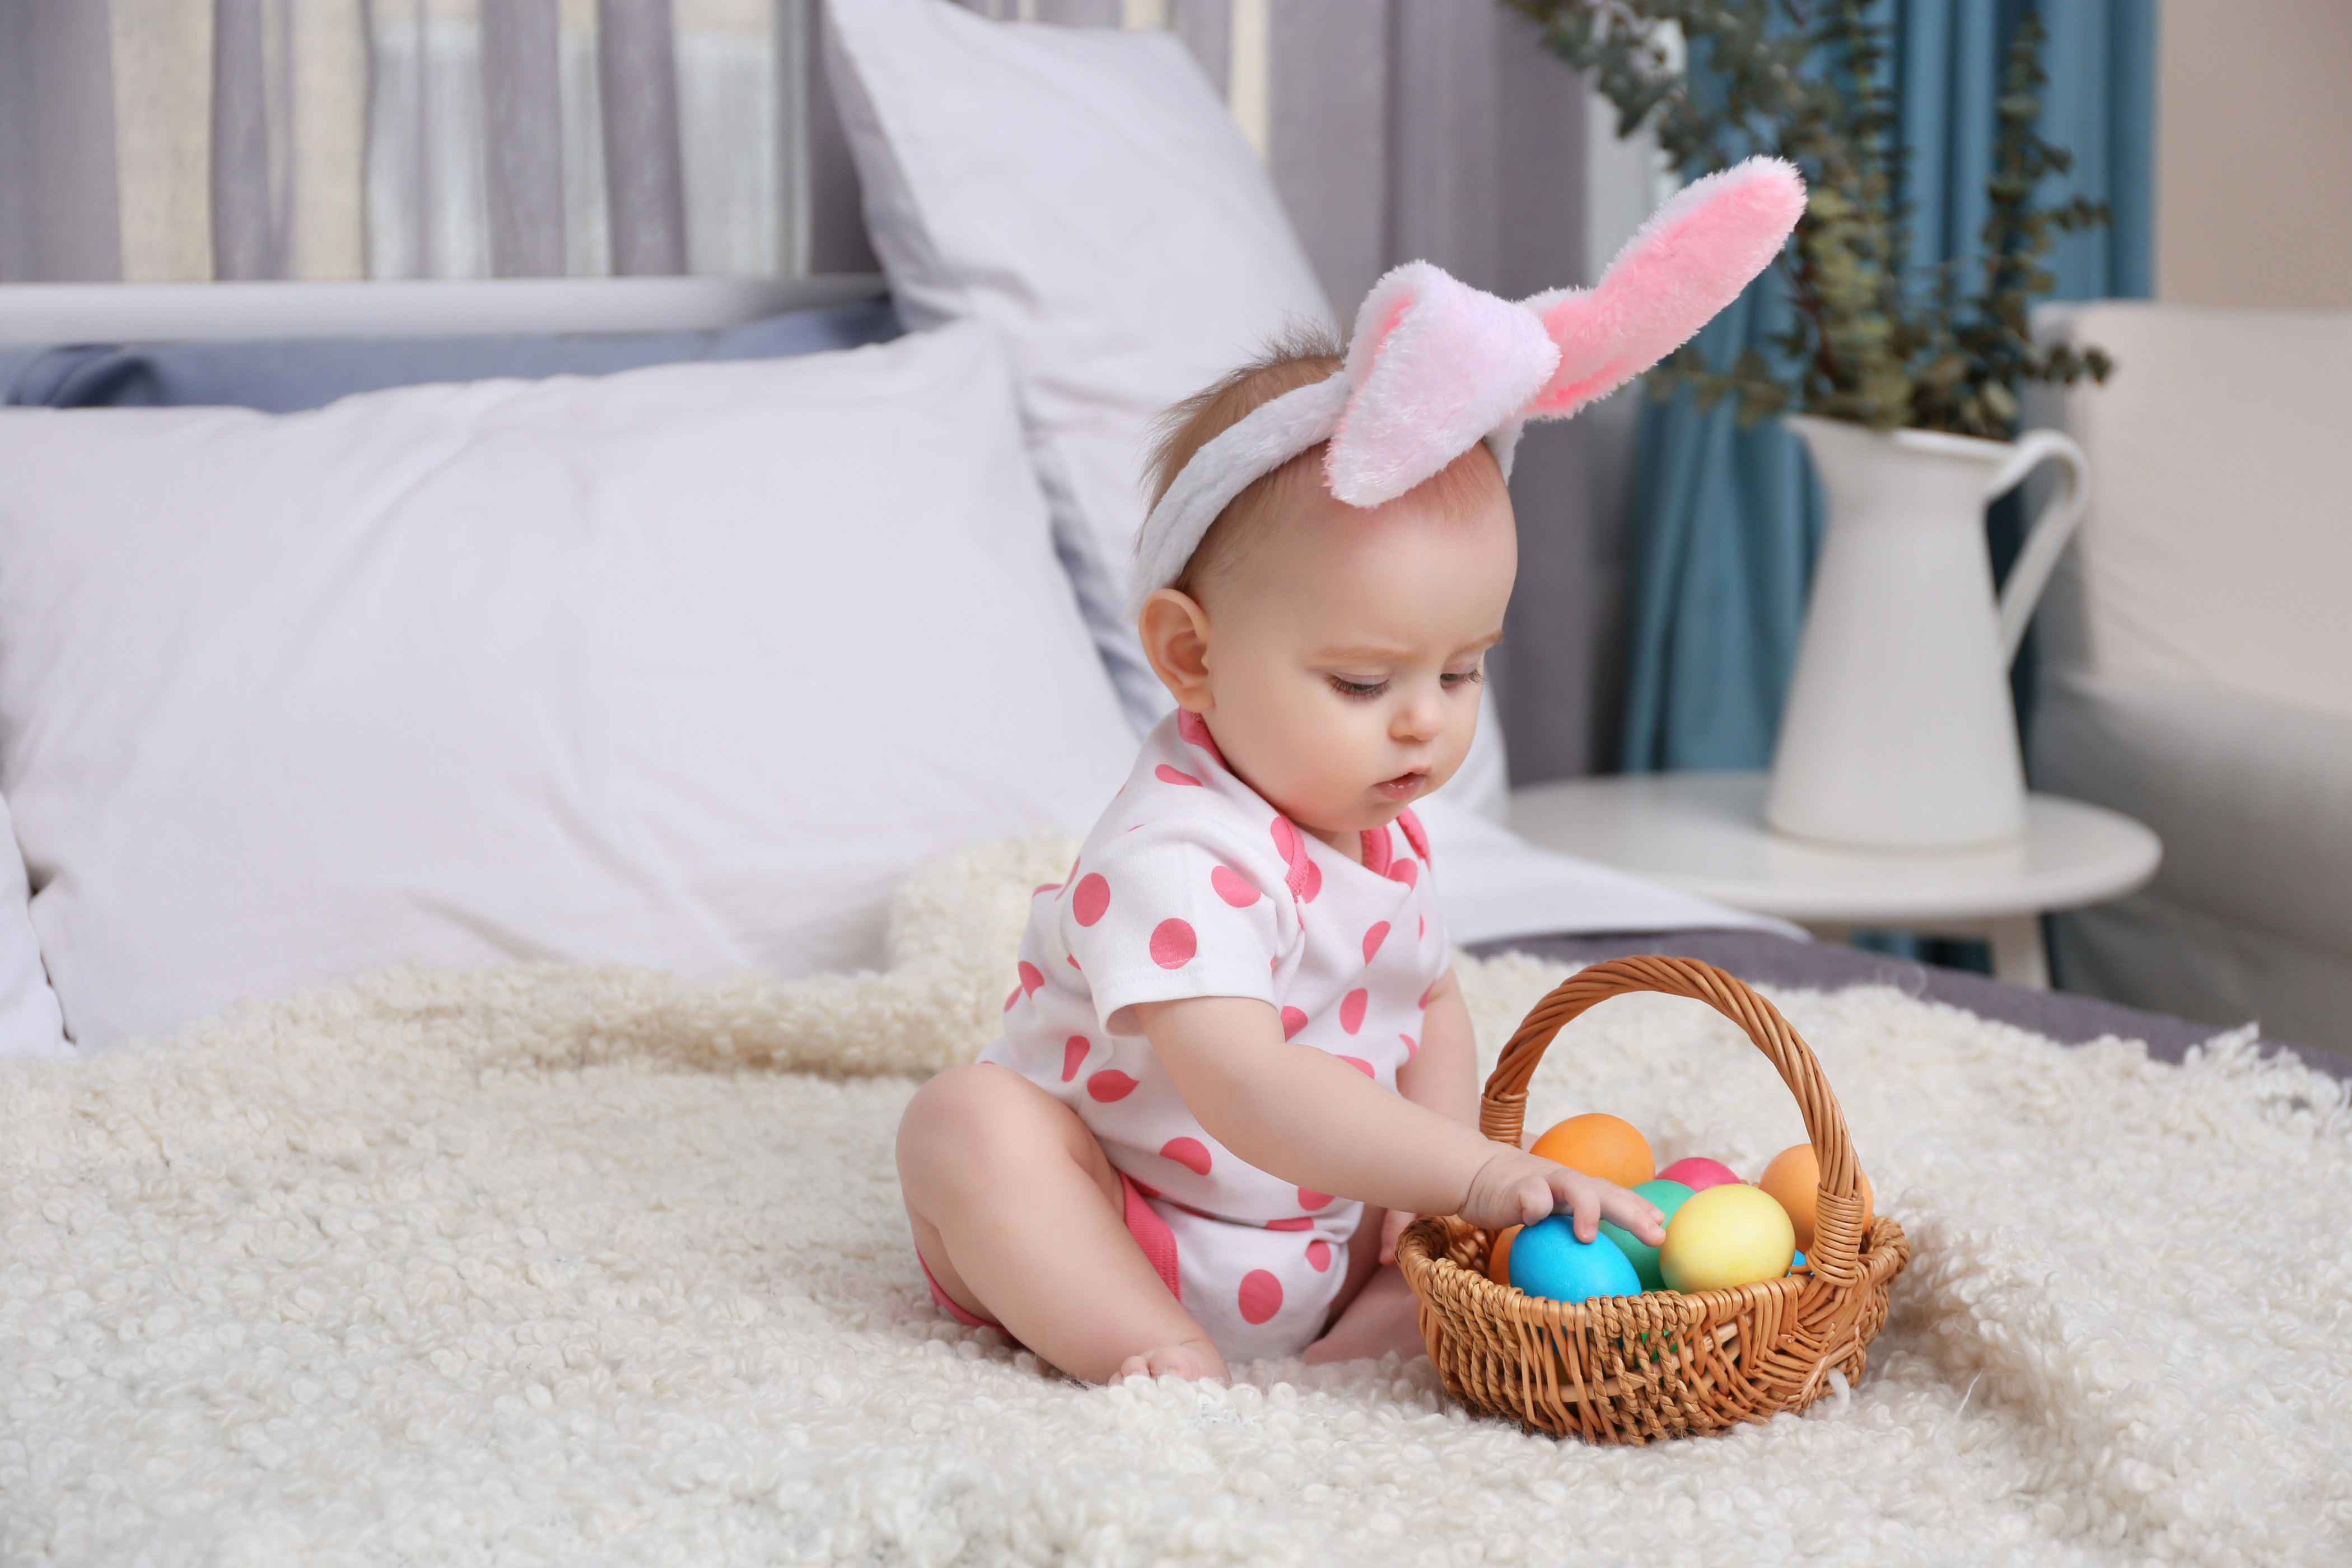 Фото Пасха младенец яйцами ребёнок Корзина 4200x2800 младенца Младенцы грудной ребёнок яиц Дети Яйца яйцо корзины Корзинка